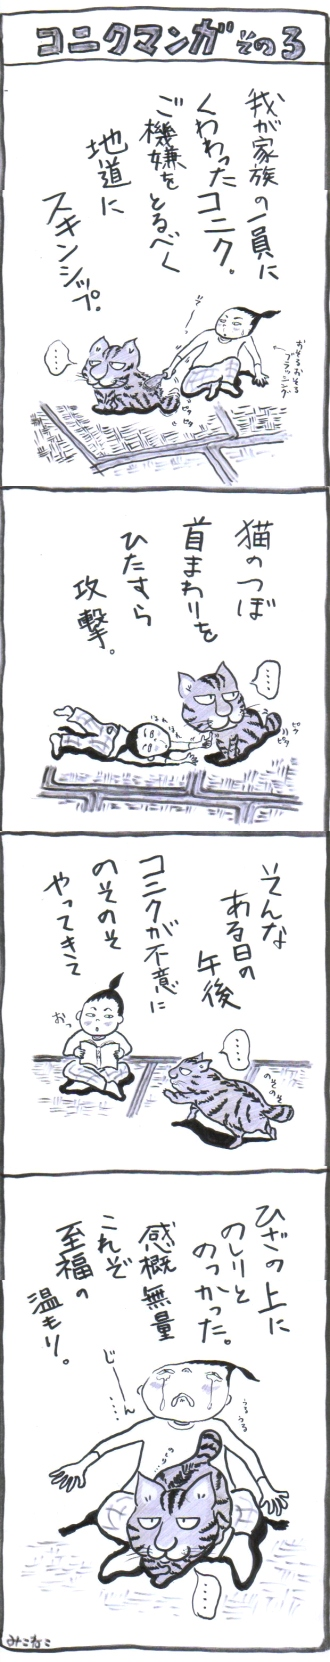 konikucomic3.JPG